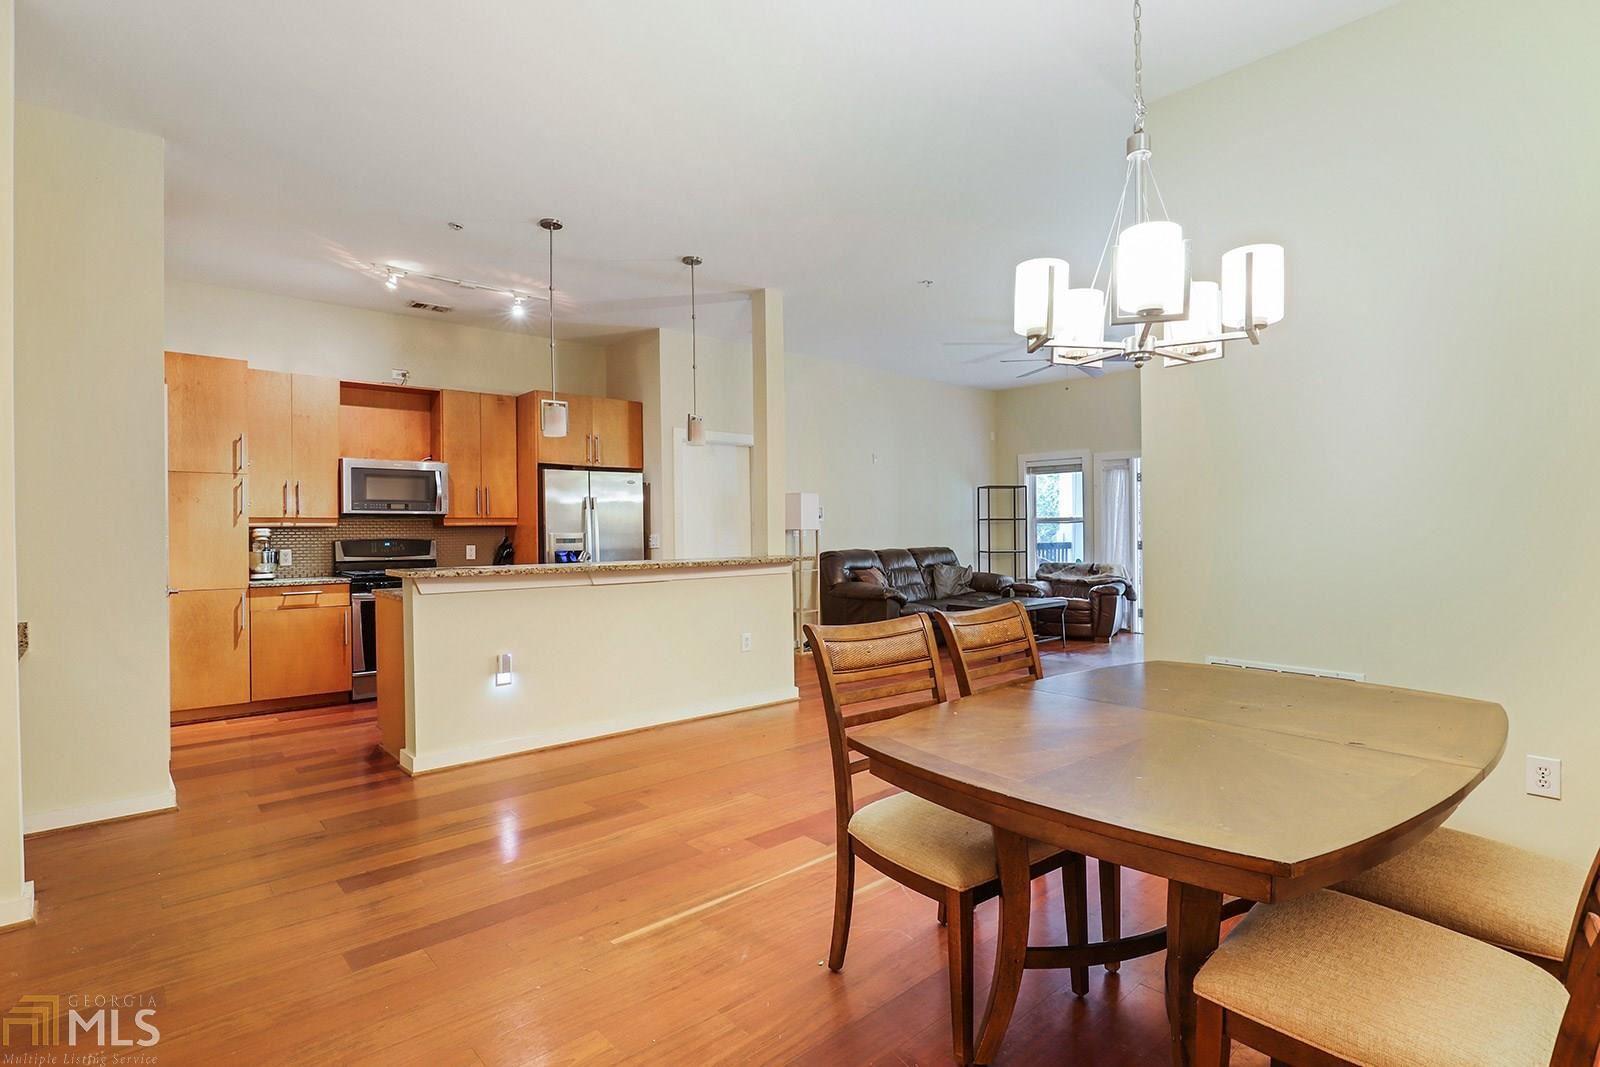 870 Inman Village Pkwy, Atlanta, GA 30307 - MLS#: 8882160